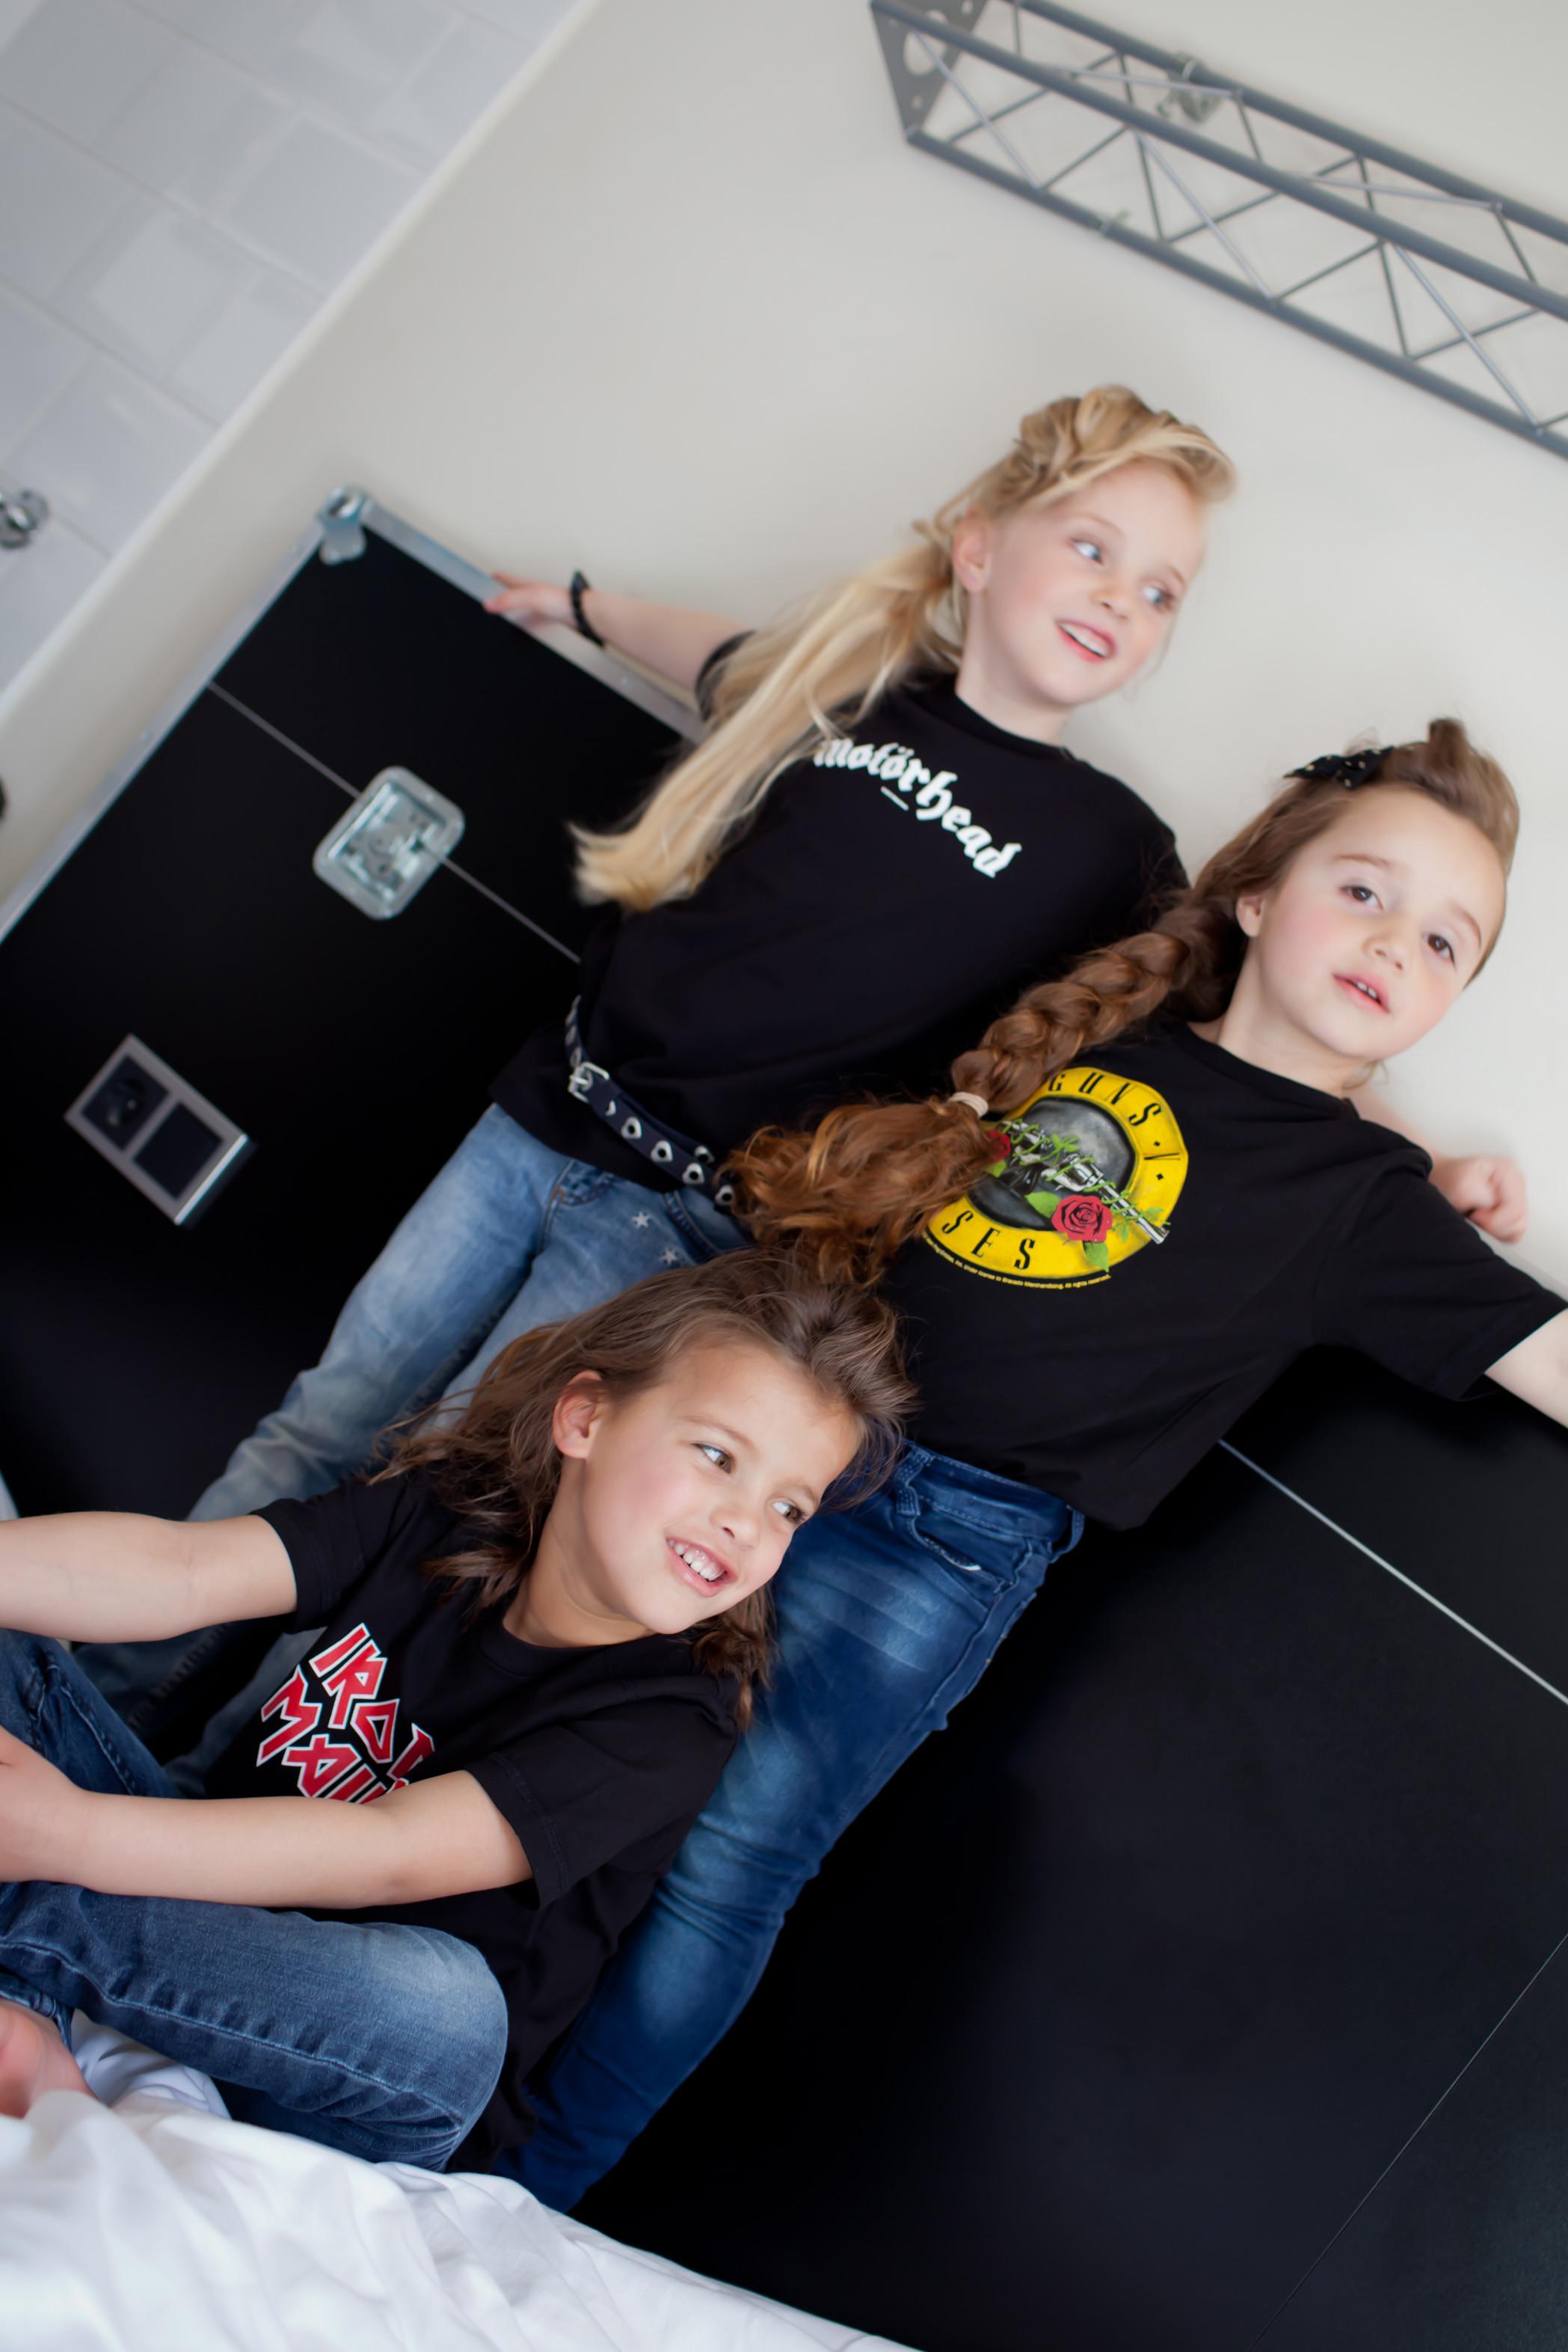 Guns n' Roses Kids/Toddler T-shirt - Tee Bullet